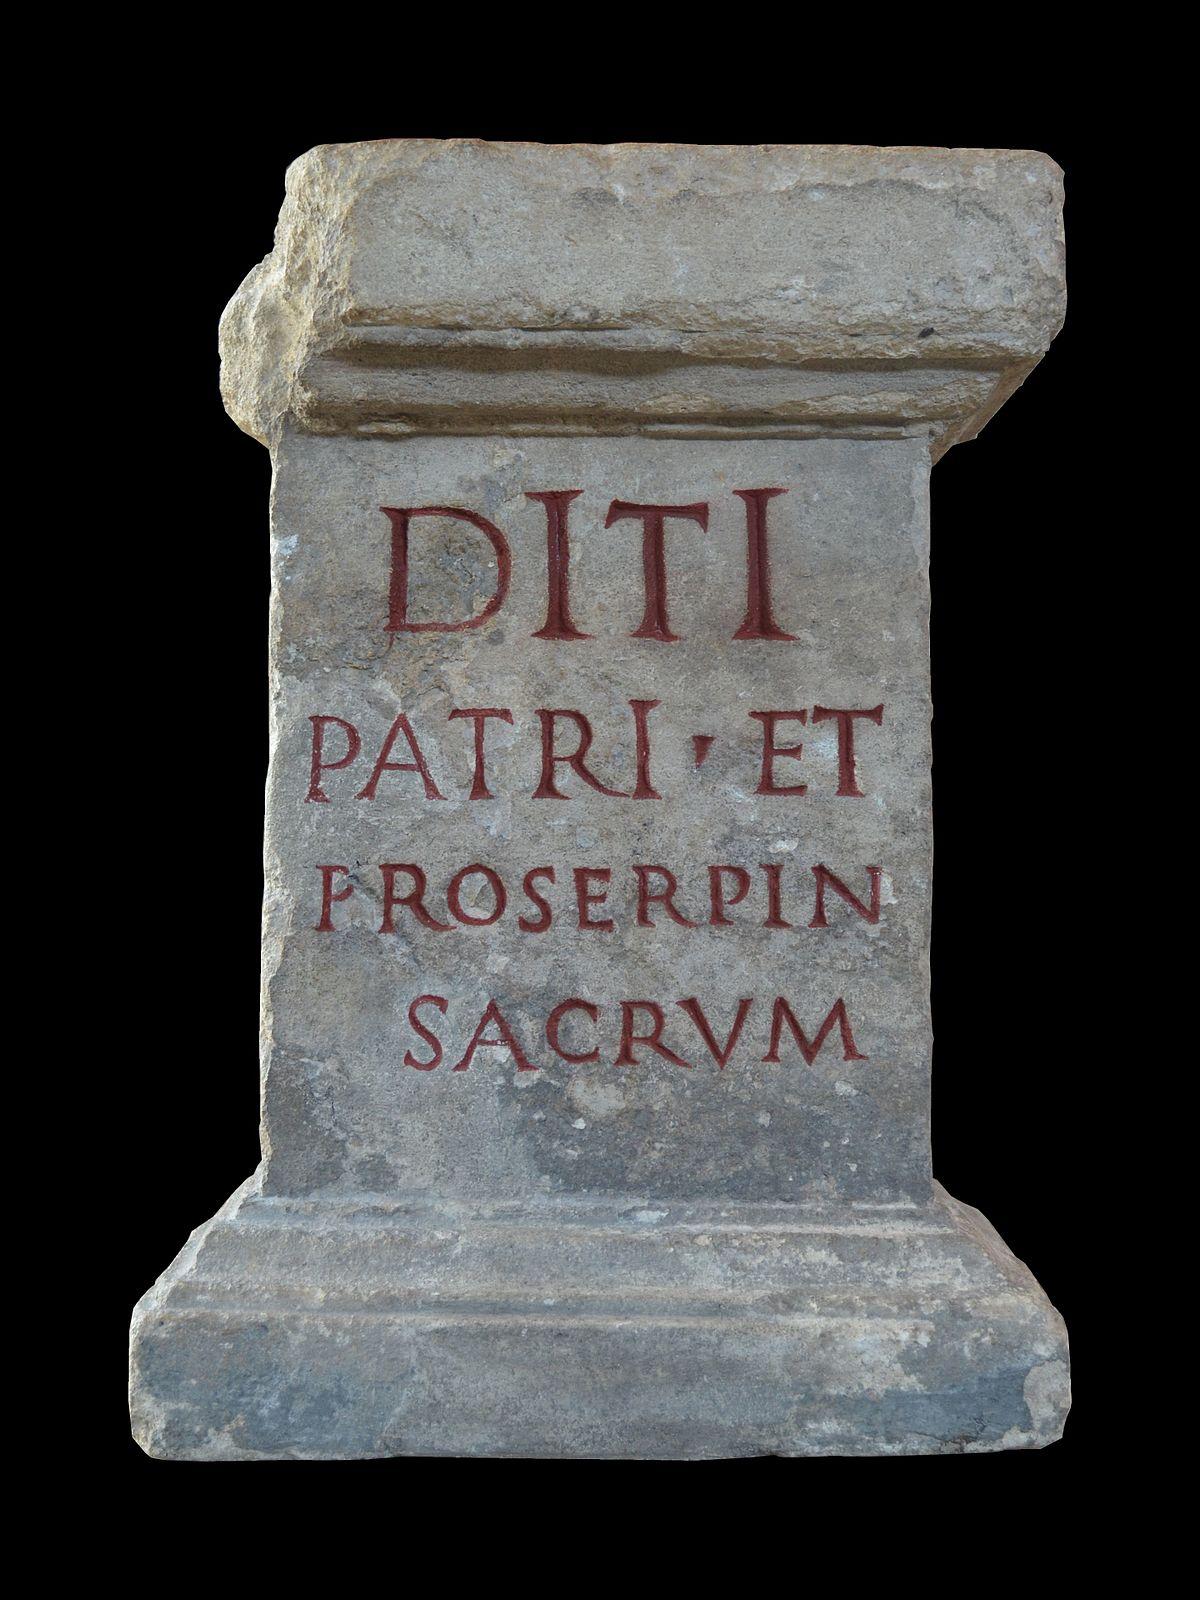 Dis Pater - Wikipedia